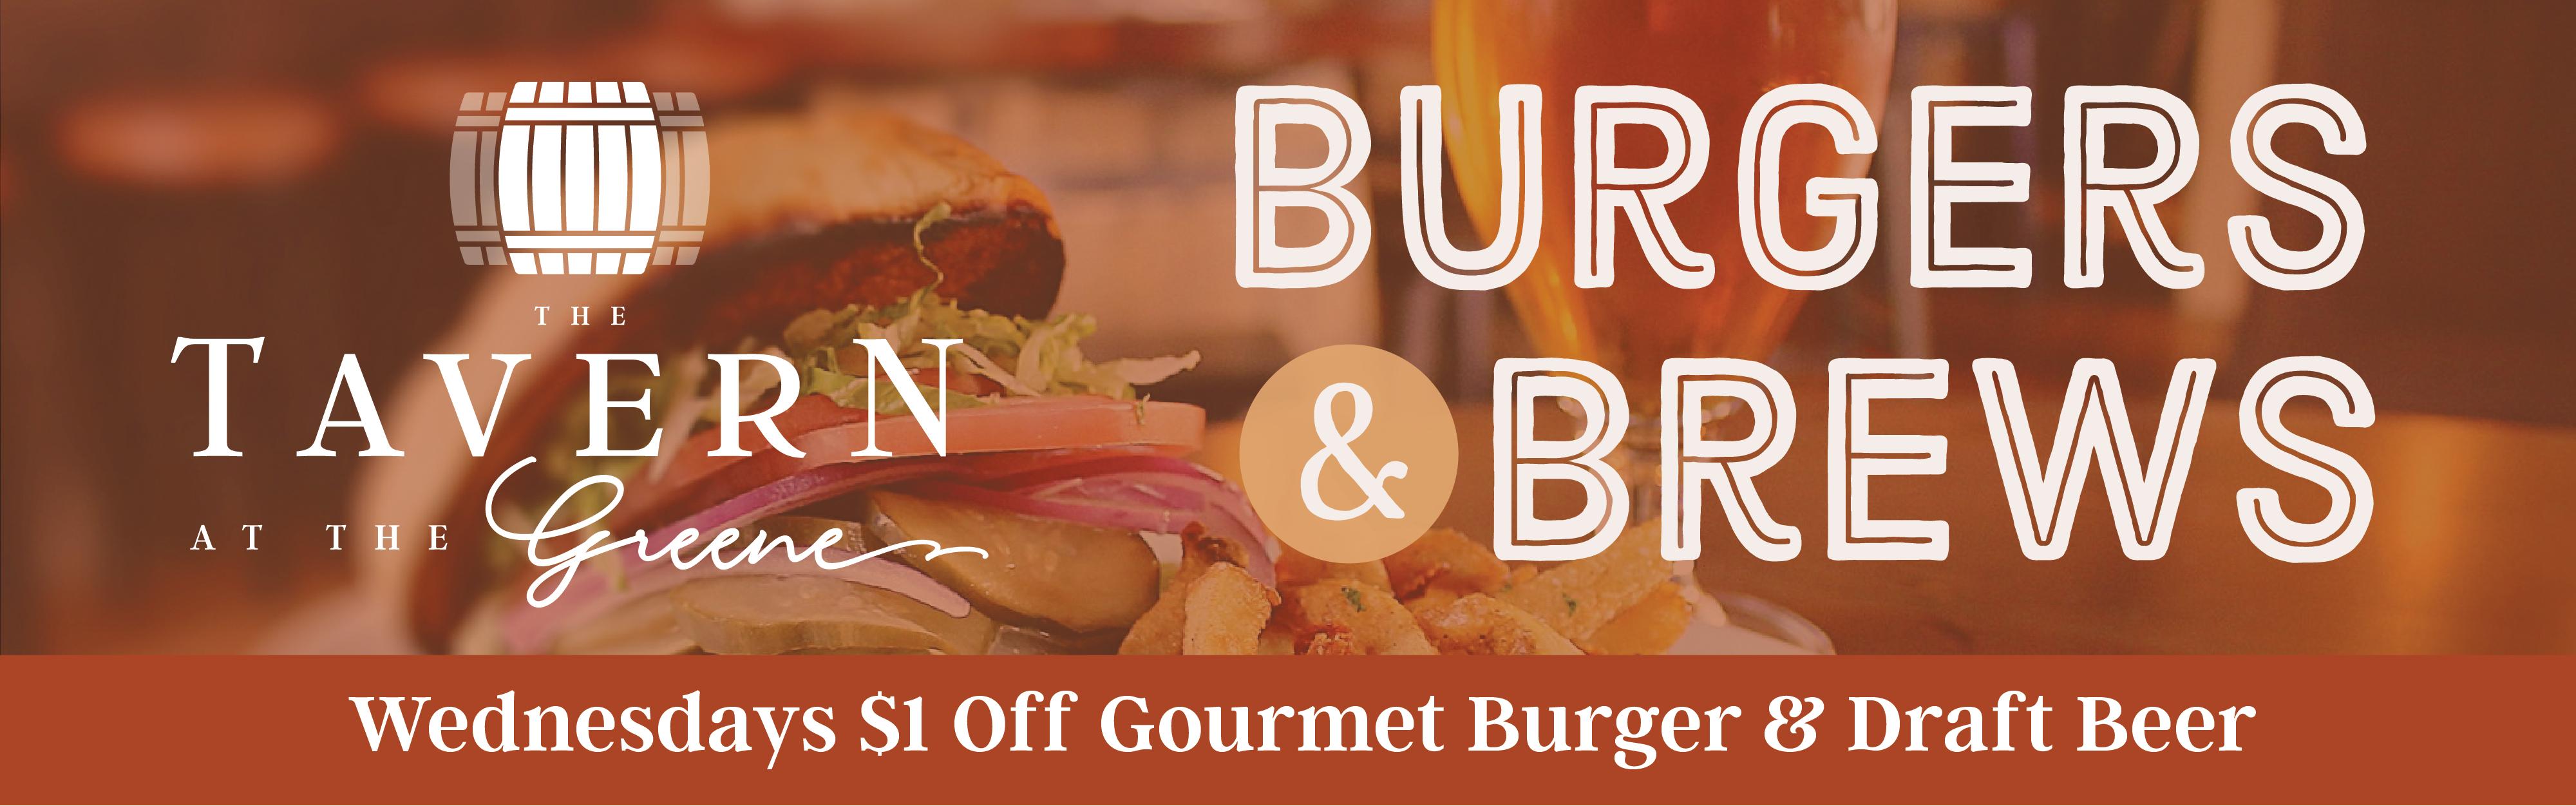 Tavern_YS_BannerAds_Burgers&Brews_Feb_960x300